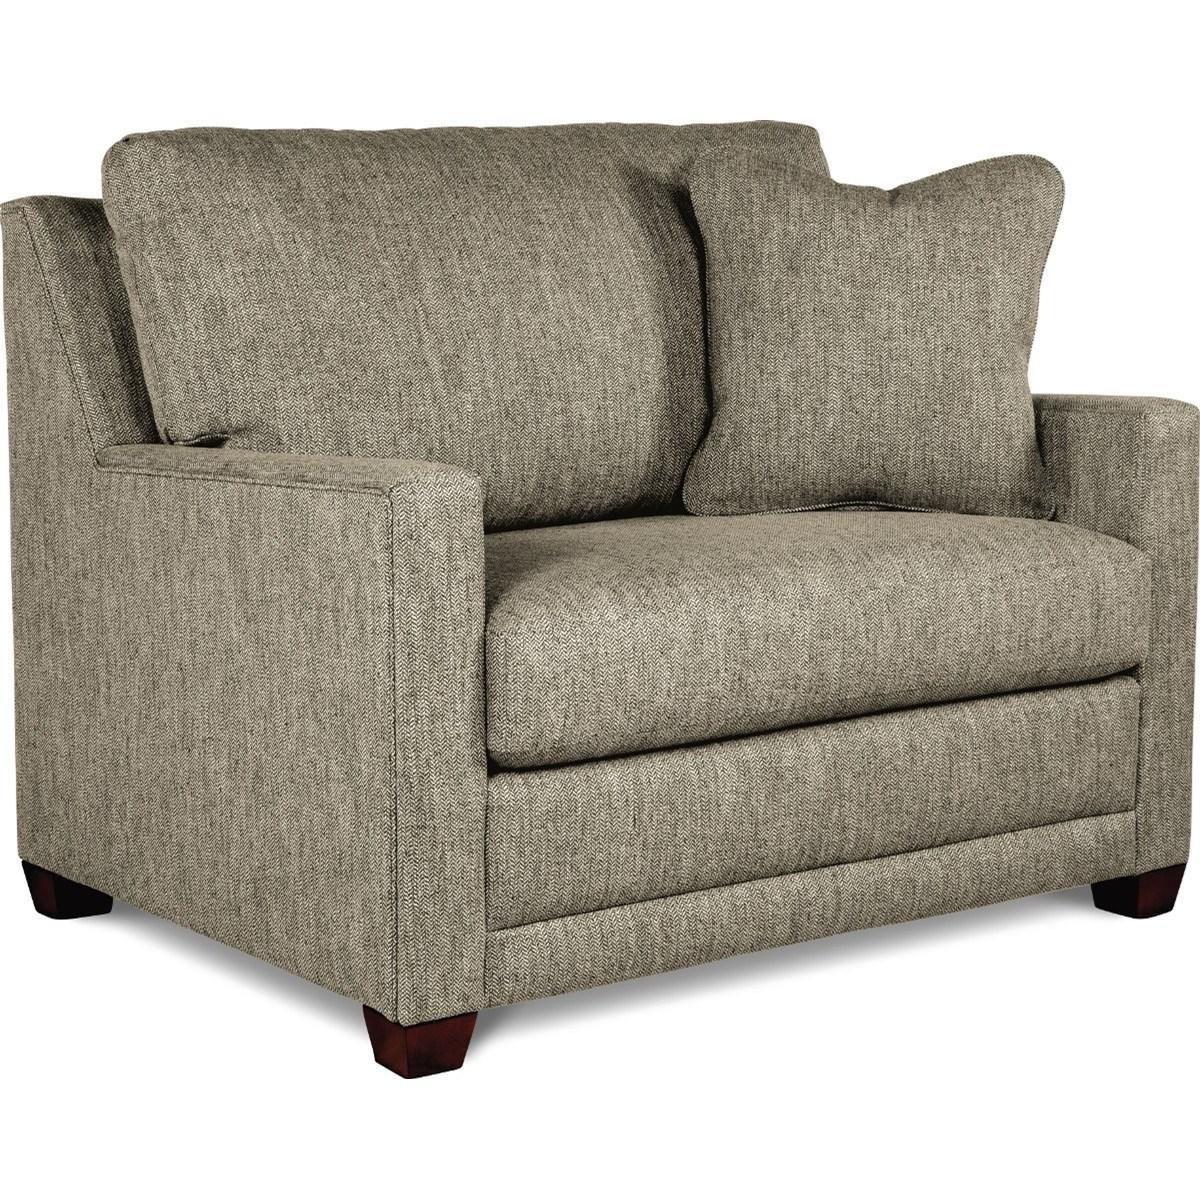 Supreme-Comfort Twin Sofa Sleeper